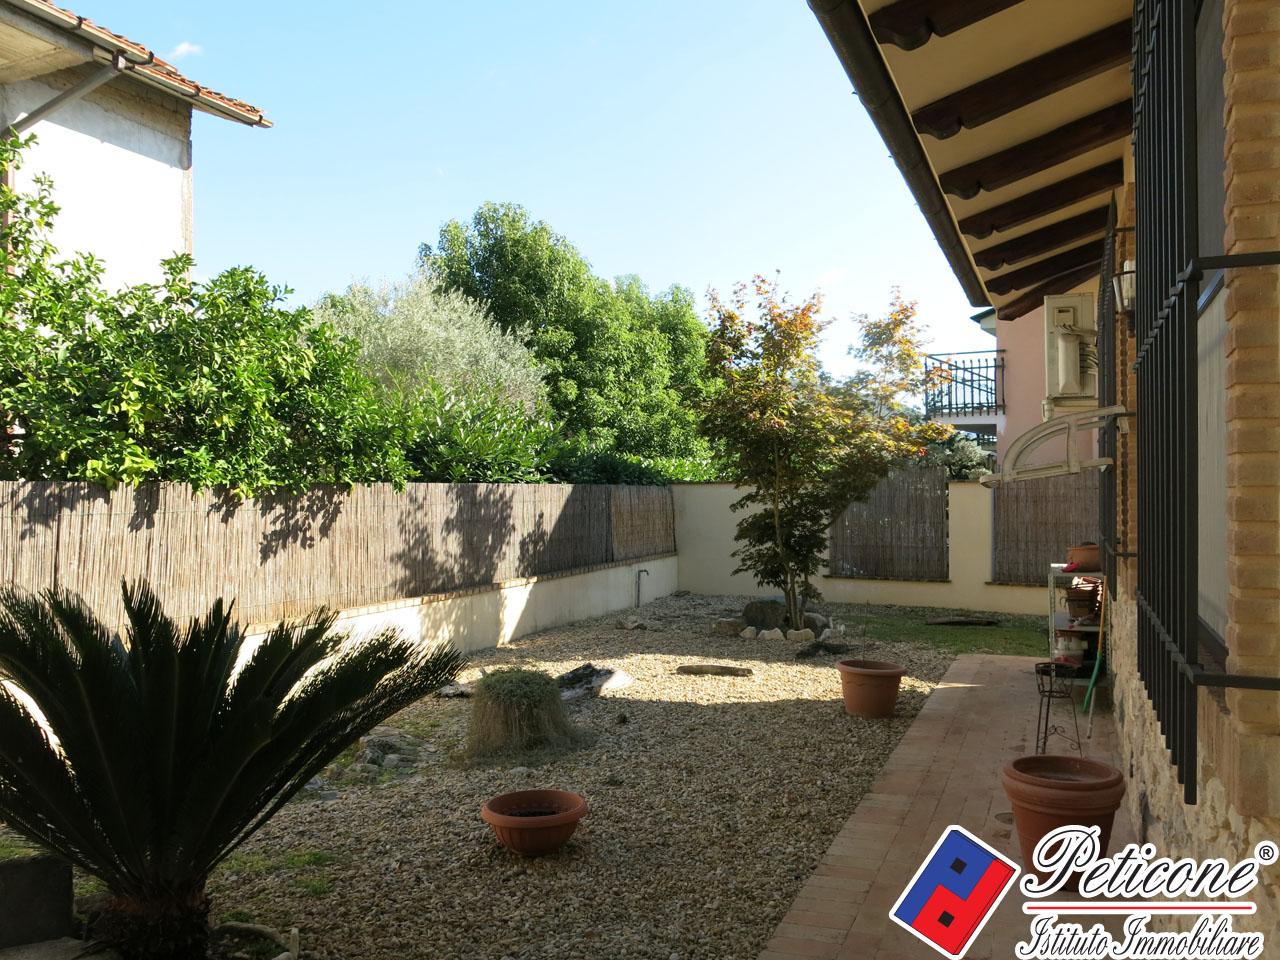 Villa in Vendita a Fondi: 3 locali, 107 mq - Foto 28